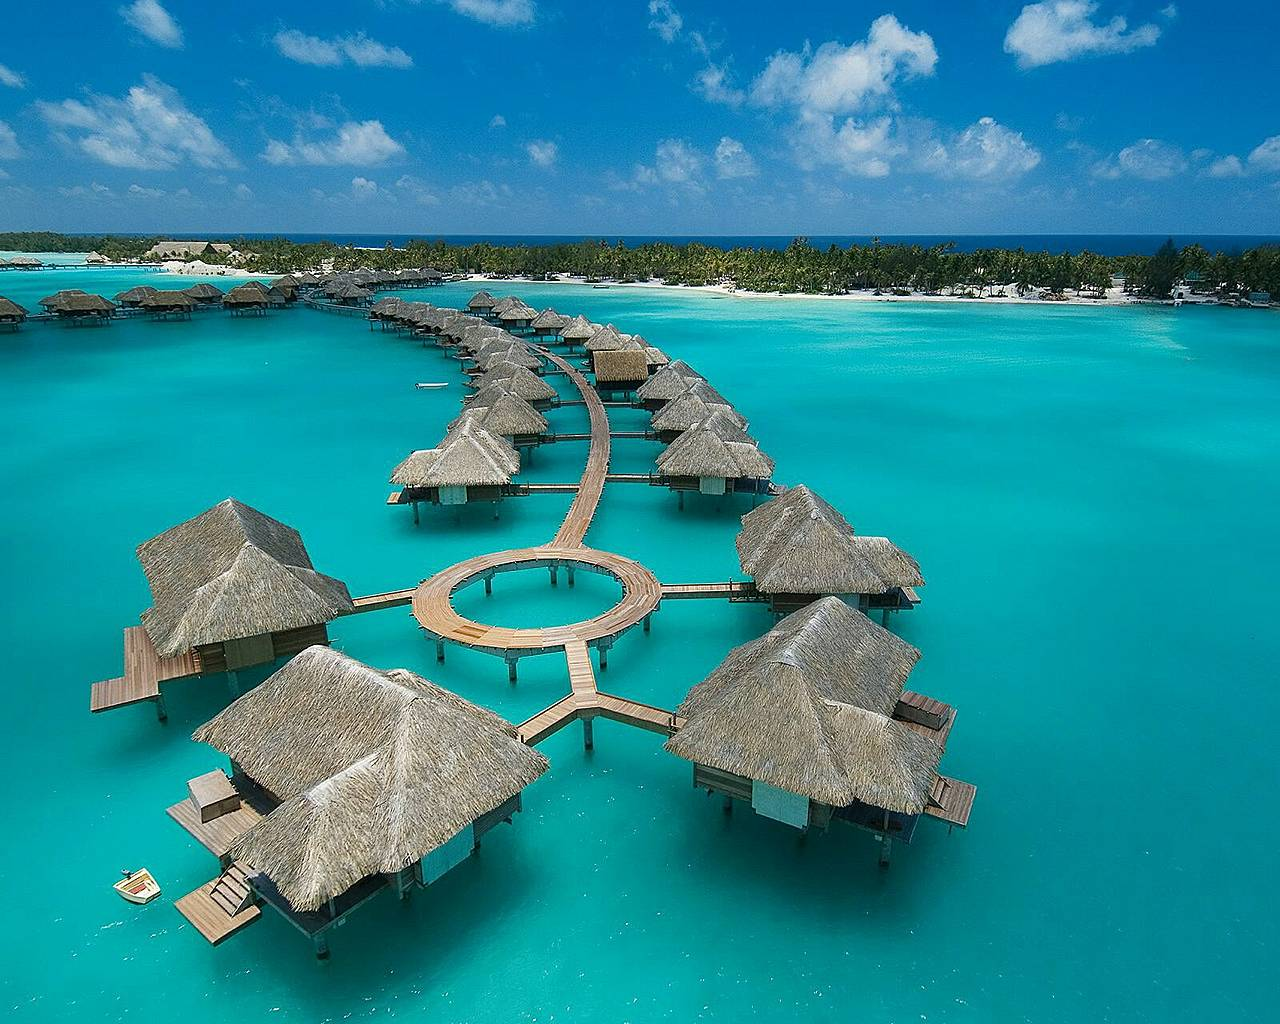 Ihram Kids For Sale Dubai: World Visits: Bora Bora Island Paradise On The Earth